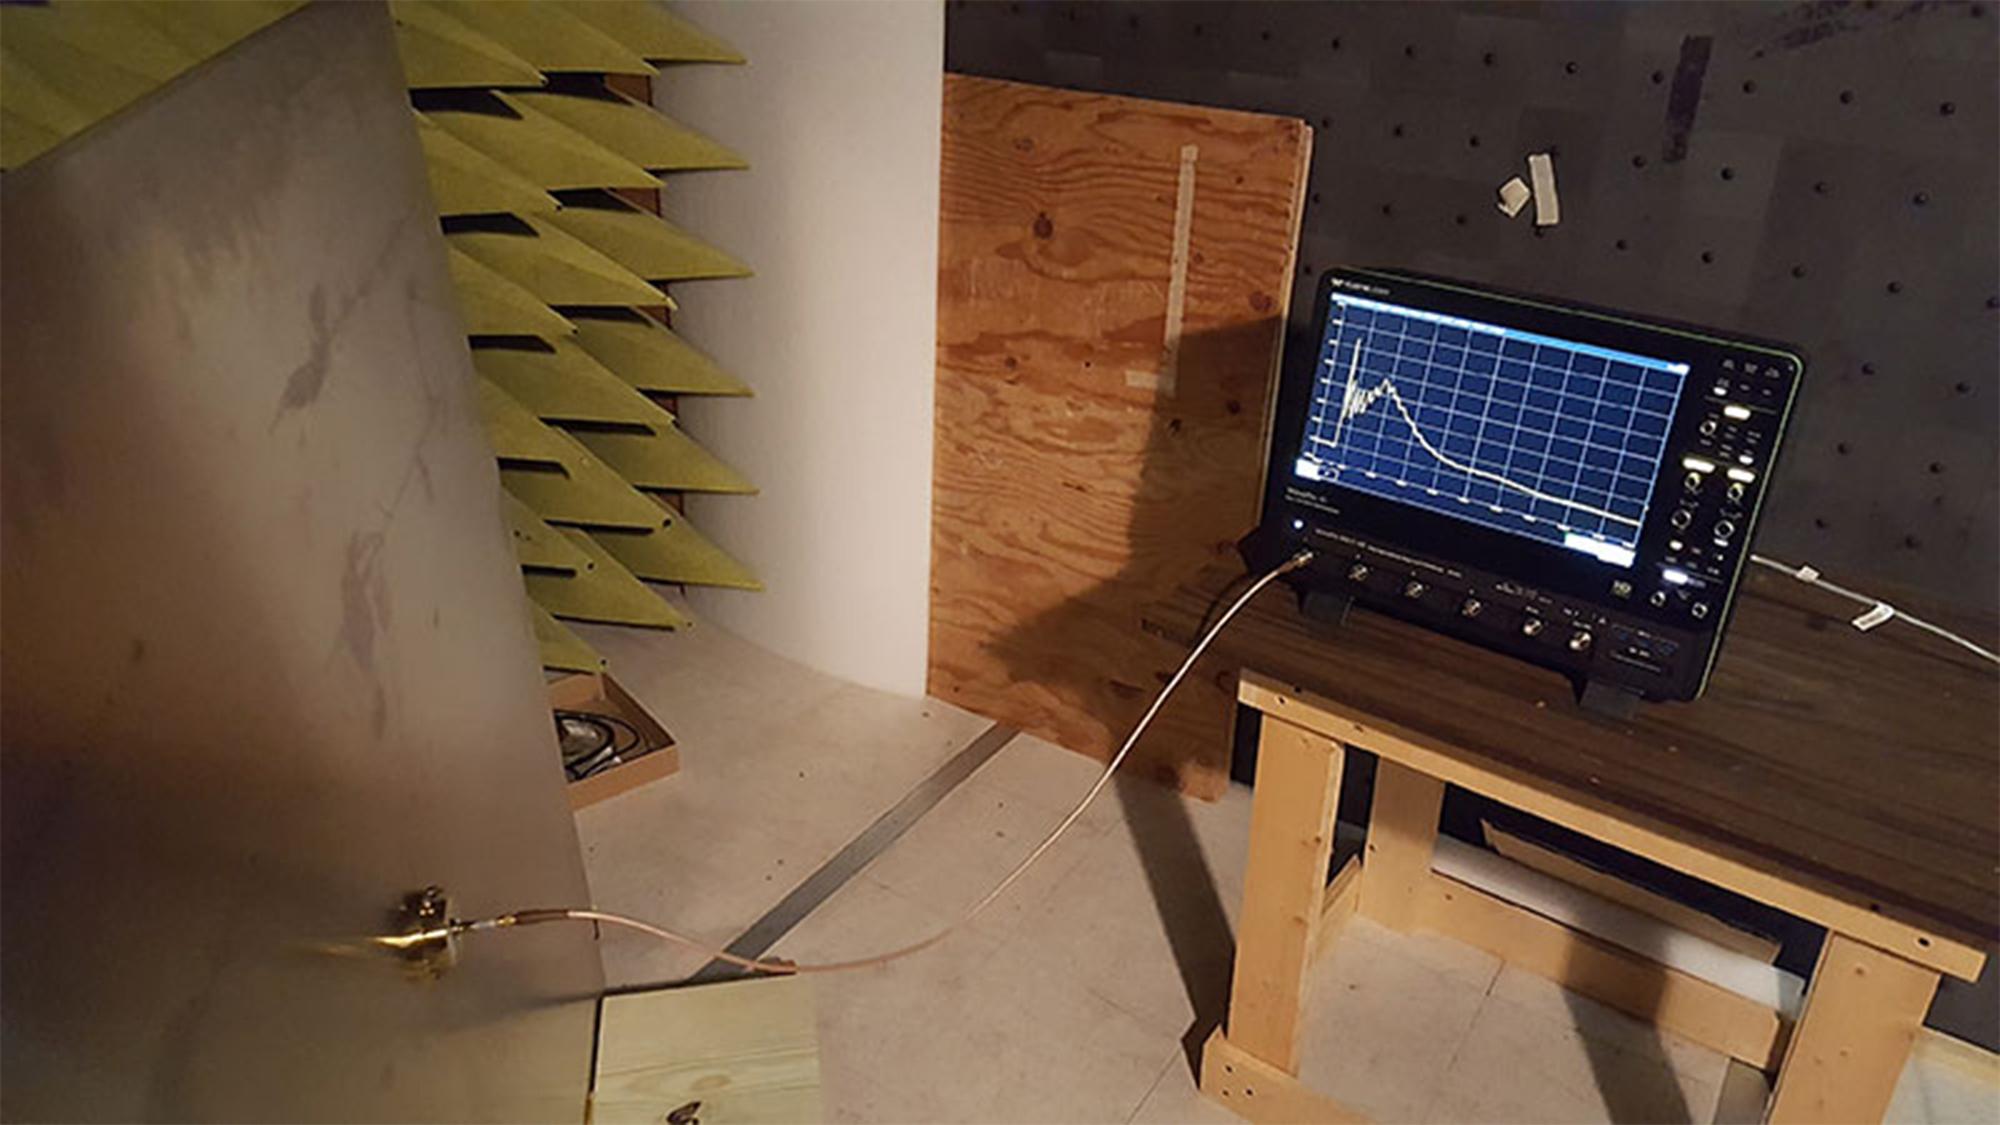 EMC / ESD Pulse Measurements Using Oscilloscopes Webinar